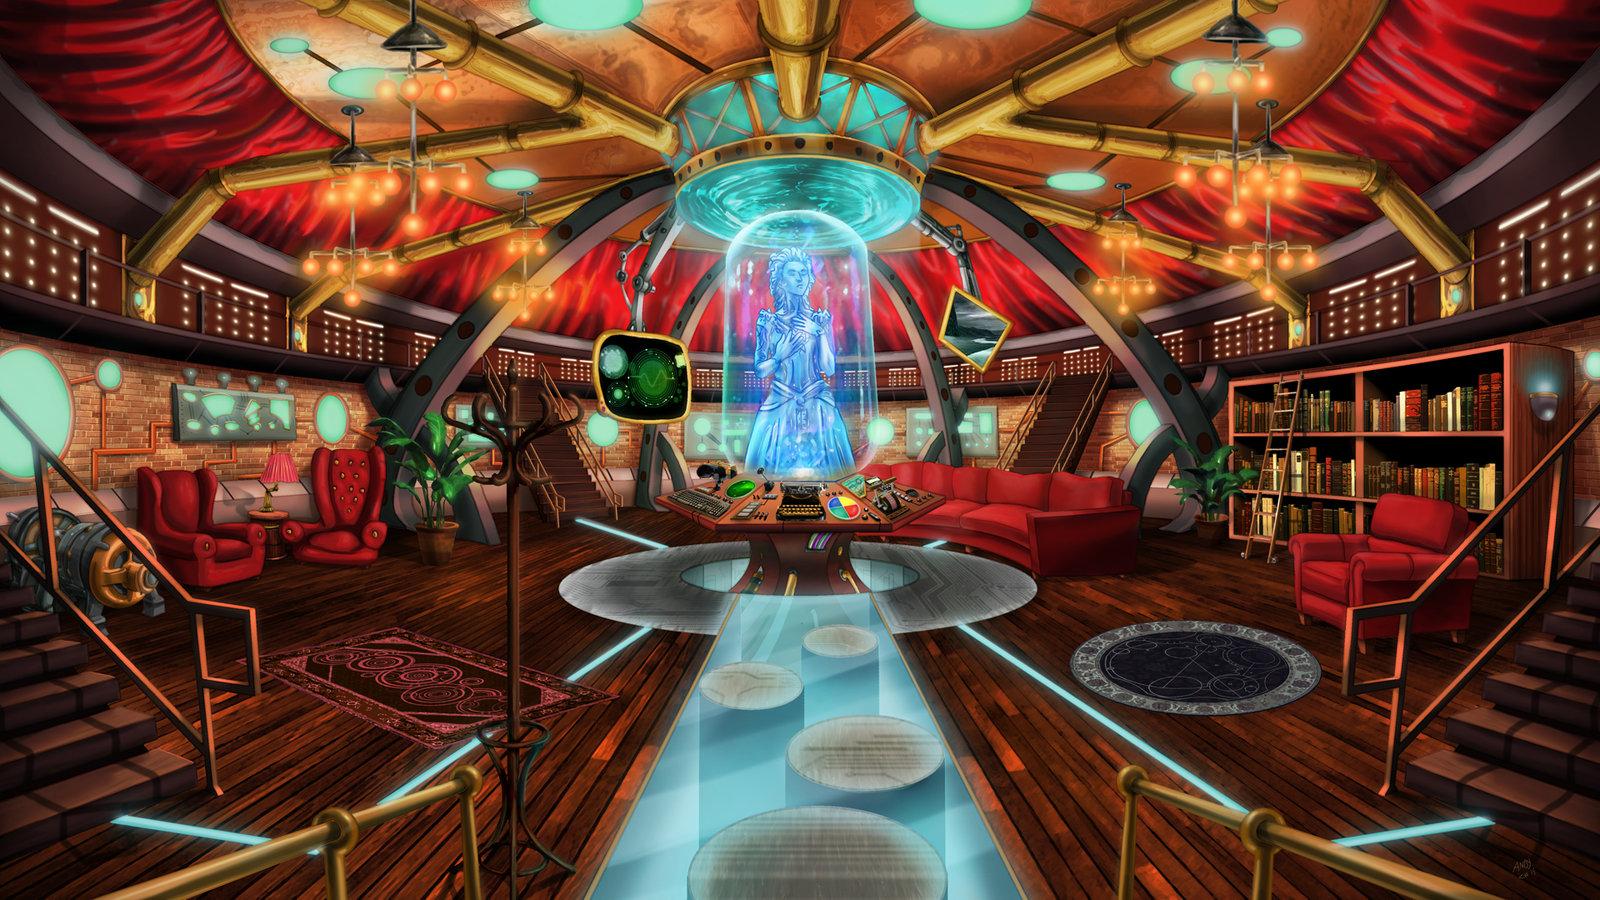 Steampunk TARDIS Interior Console Room by Wonderwig 1600x900